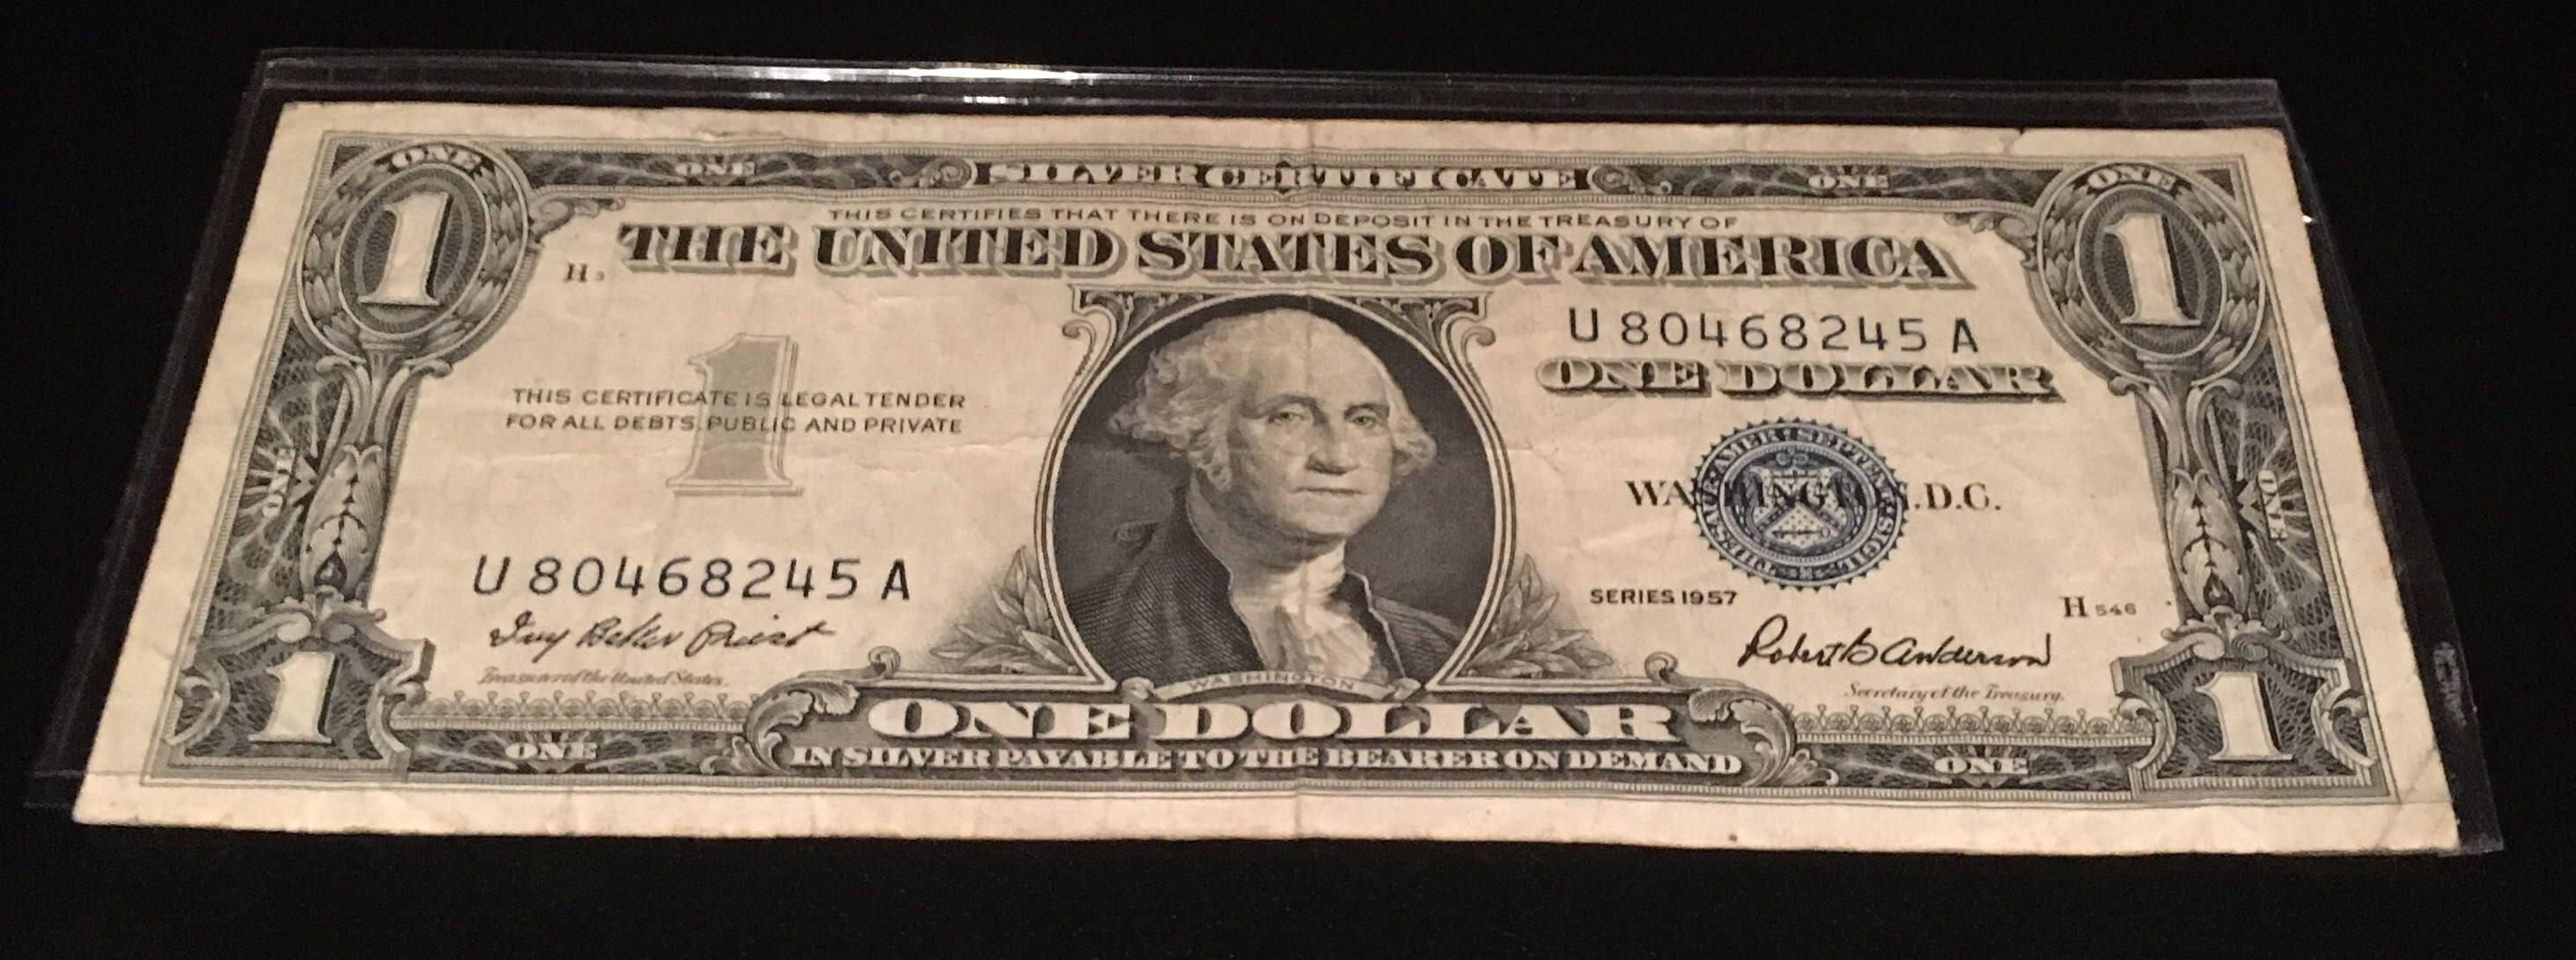 1957 Blue Seal Certificate Blue Seal One Dollar Bill Free